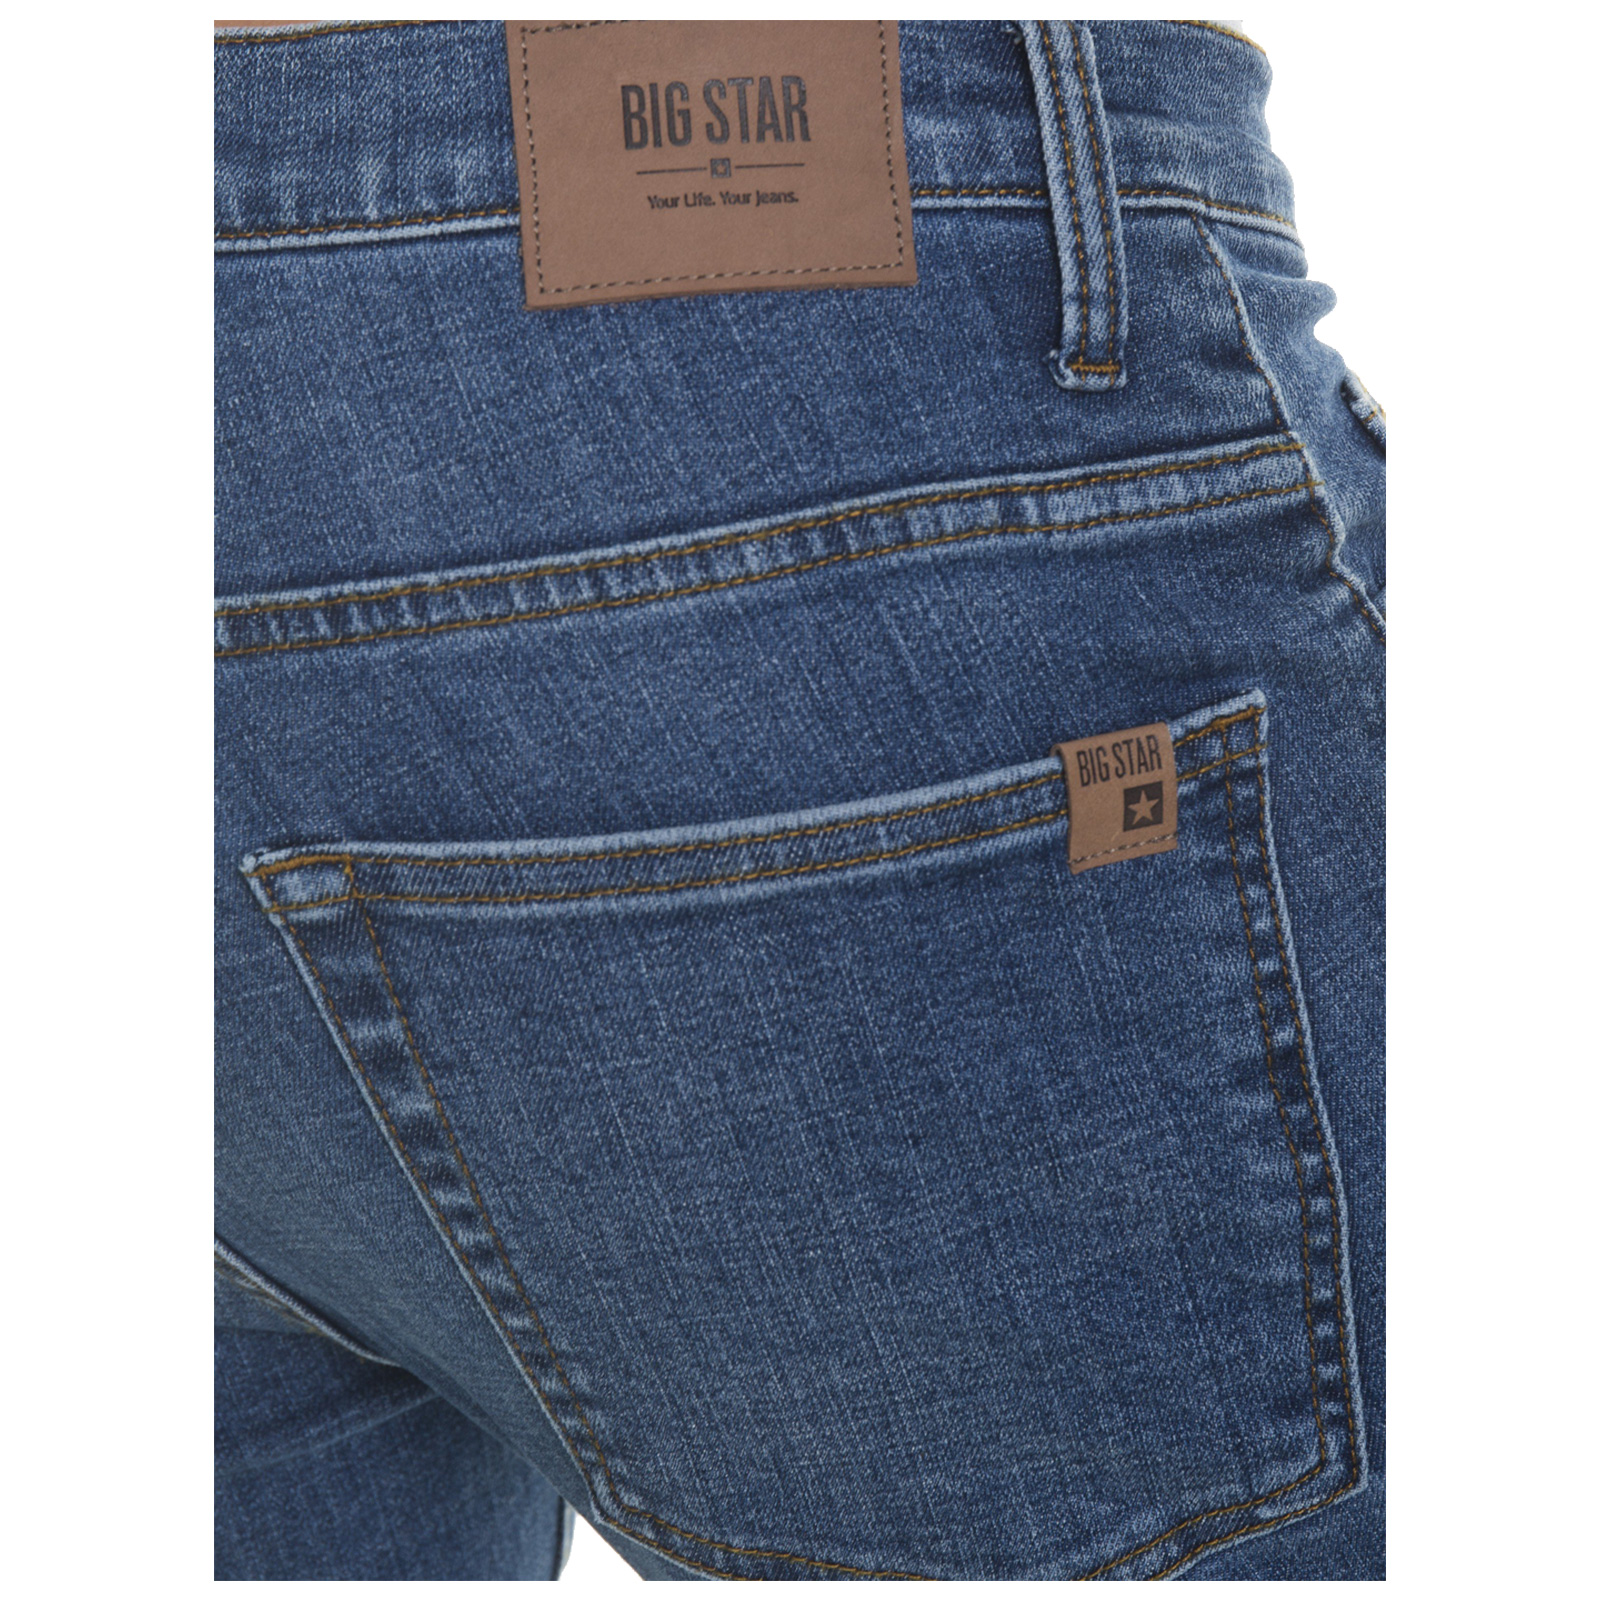 Big-Star-Mens-Denim-Jeans-Straight-Tapered-Leg-Style-Designer-Casual-Trousers thumbnail 11